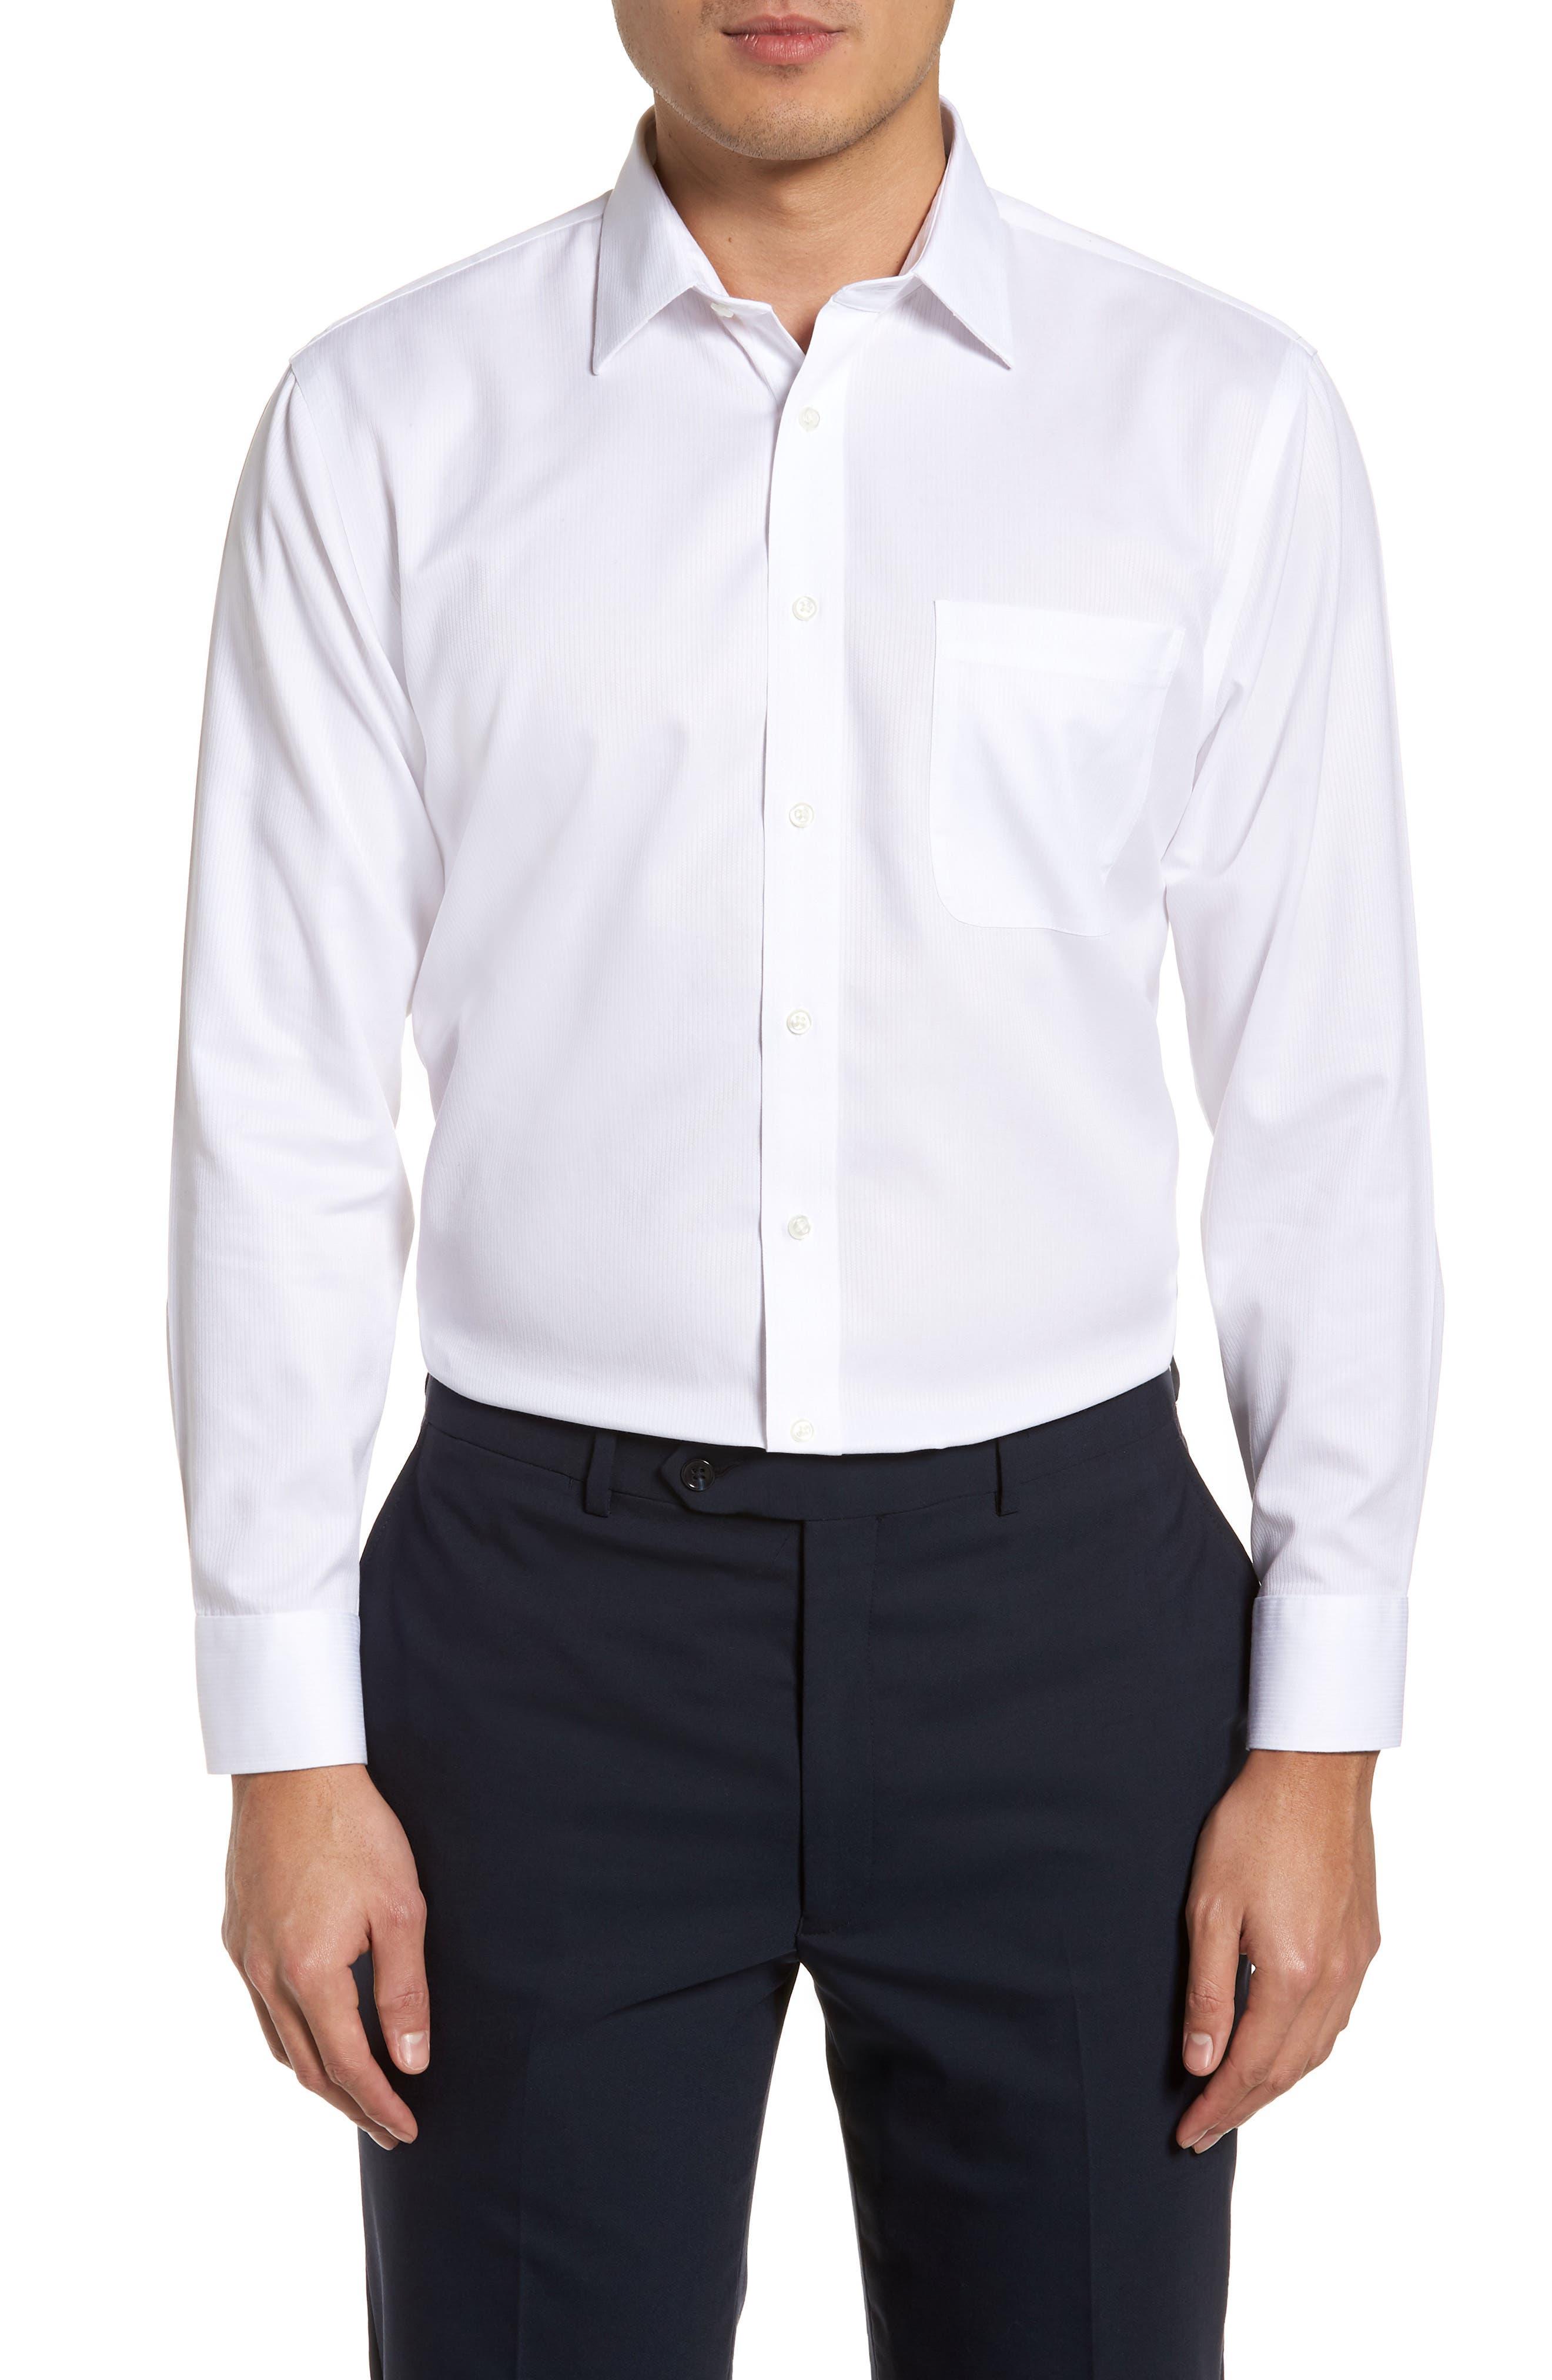 Nordstrom Shop Smartcare(TM) Trim Fit Dress Shirt